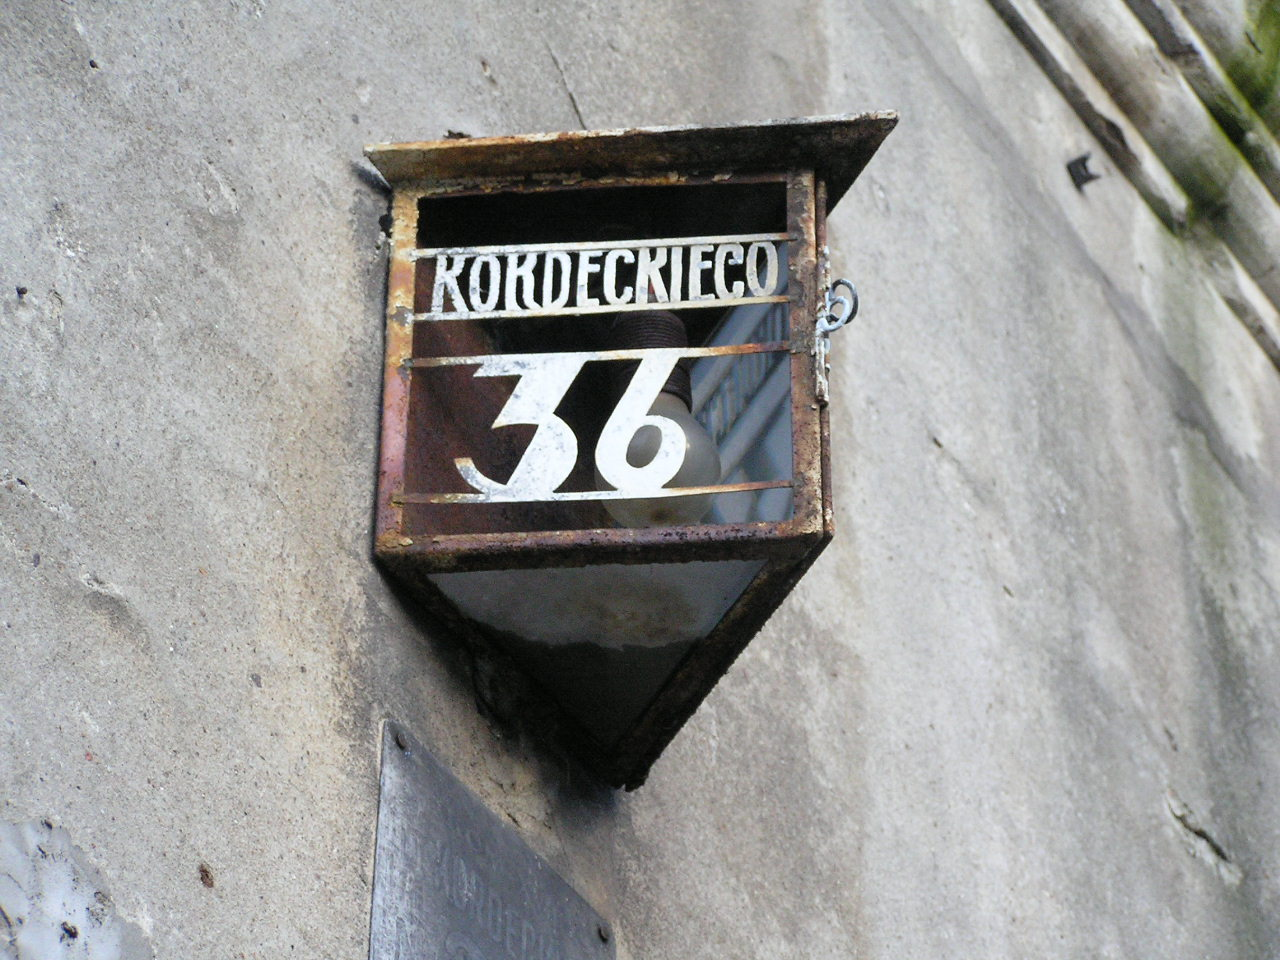 Latarenka adresowa - Kordeckiego 36